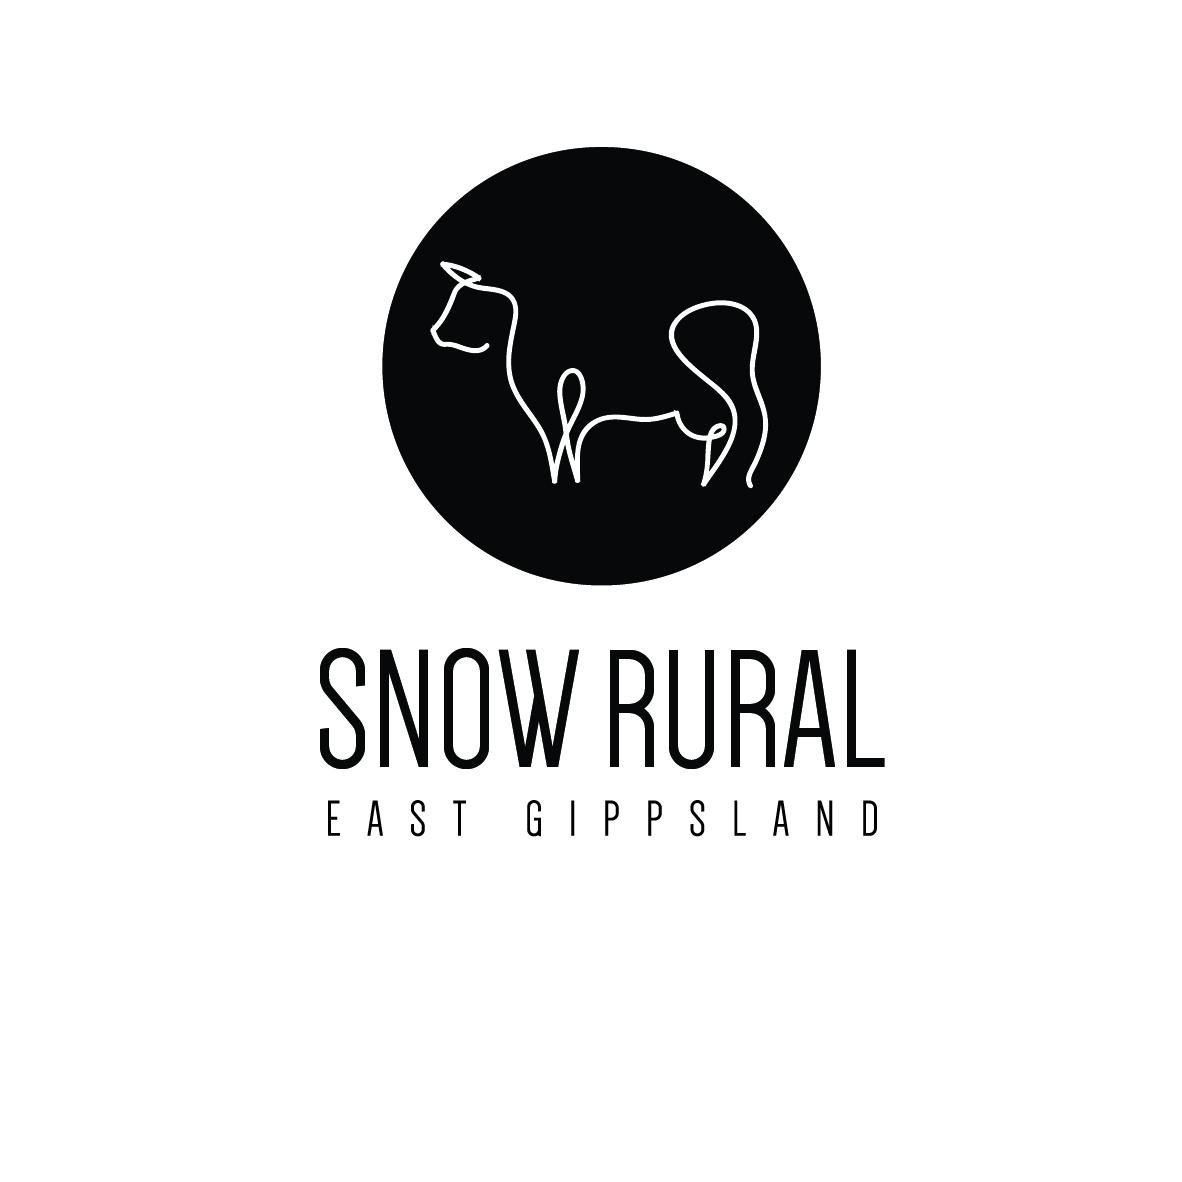 SnowRural